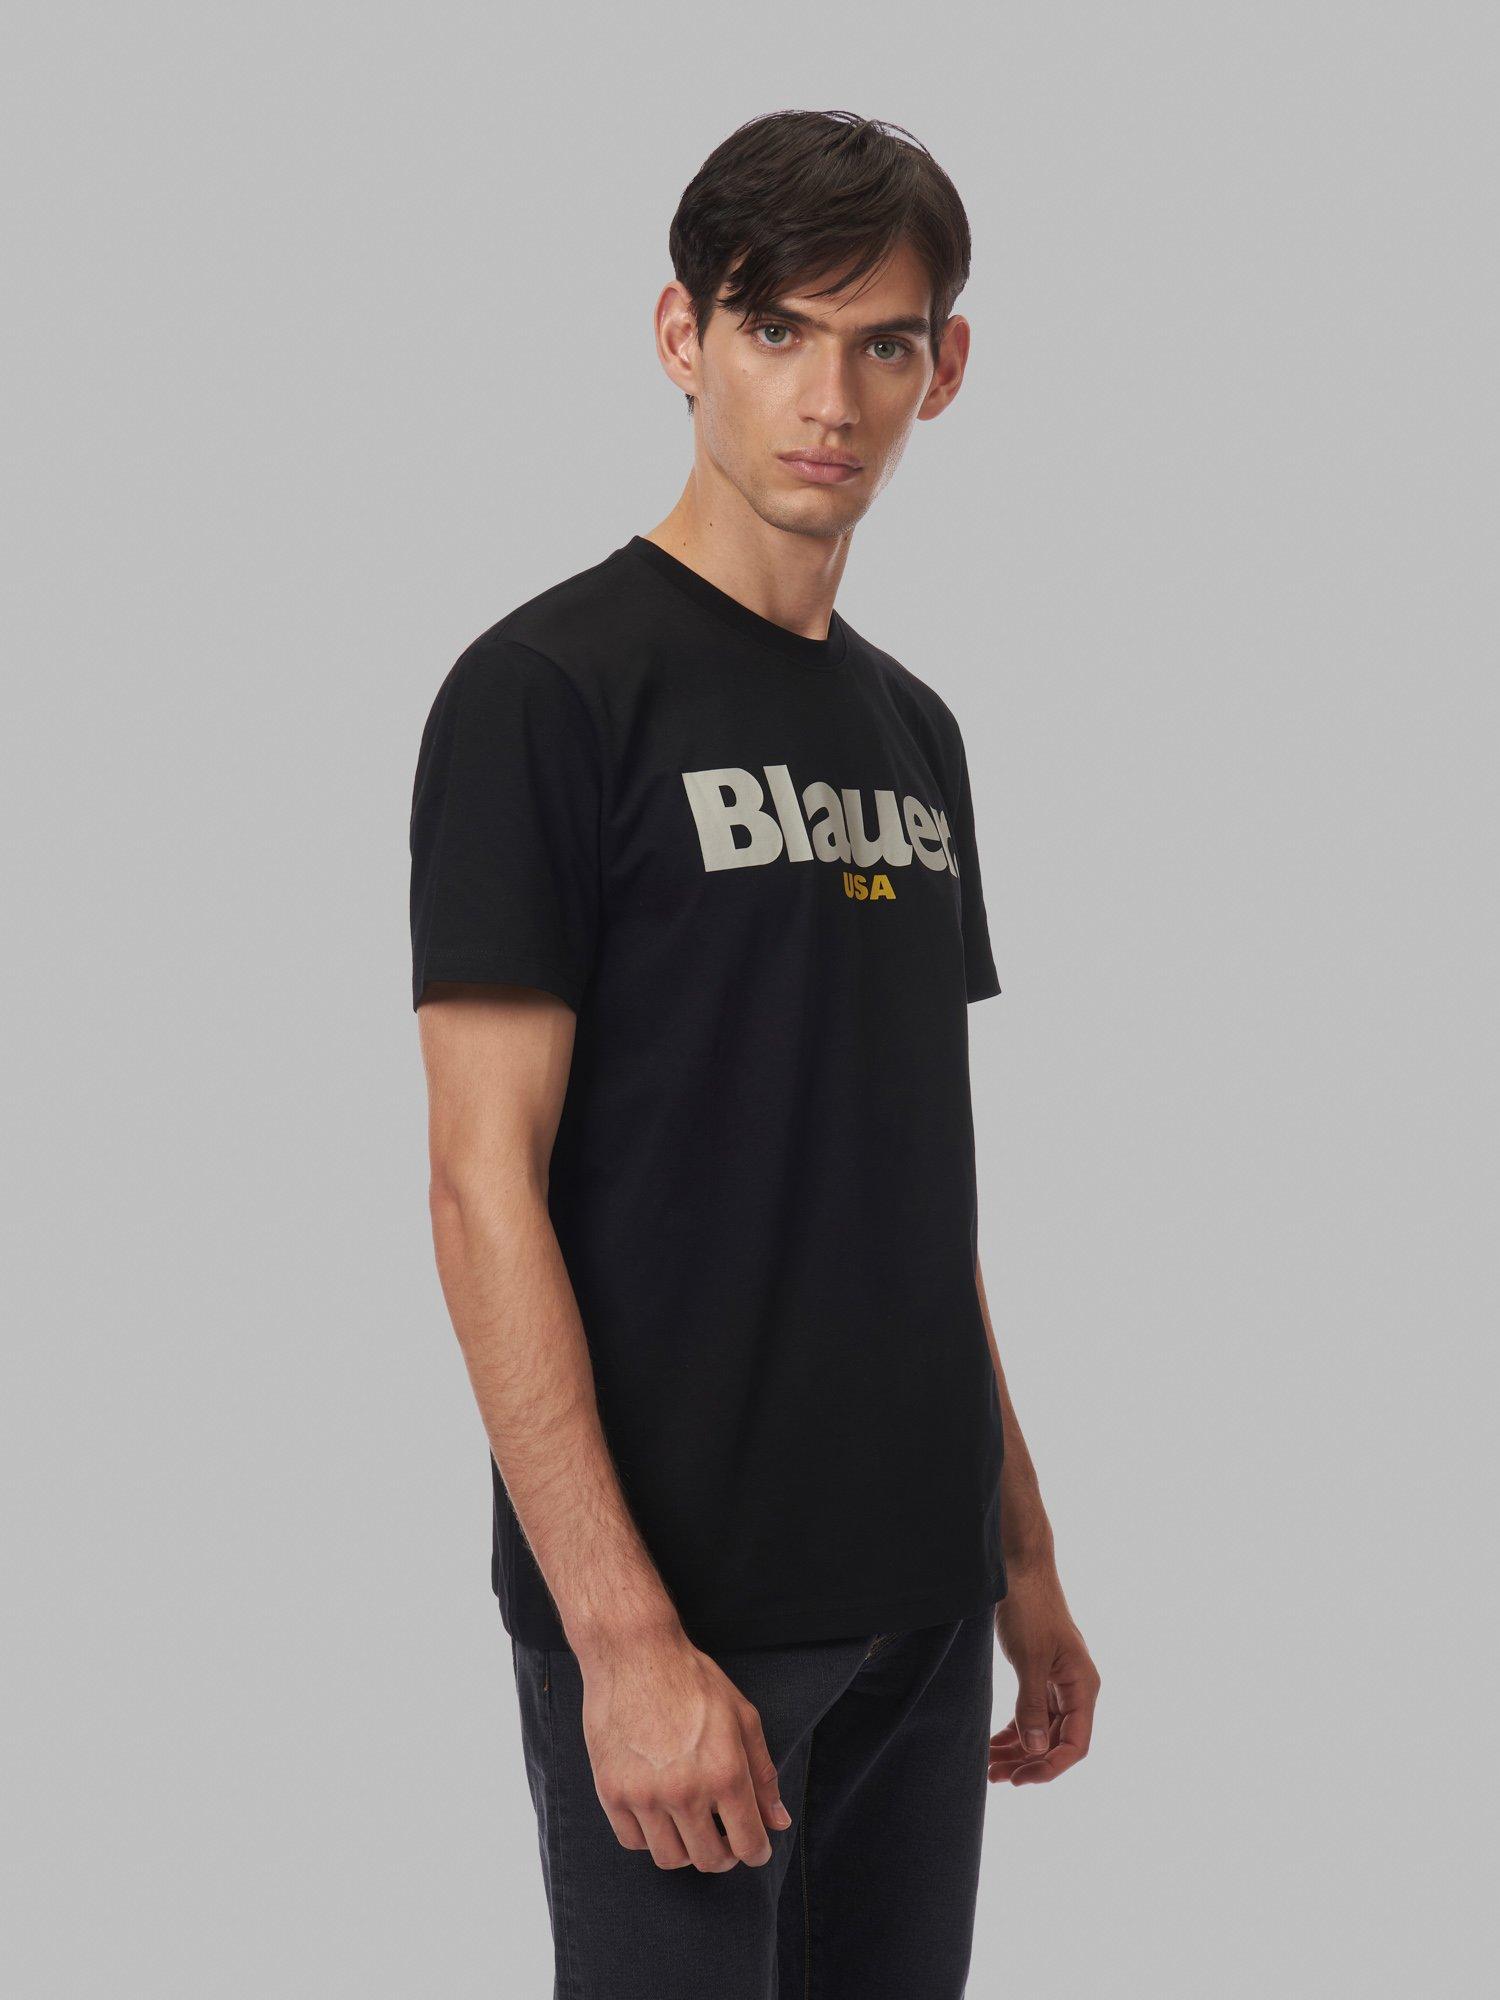 Blauer - ФУТБОЛКА С КОРОТКИМ РУКАВОМ - черный - Blauer